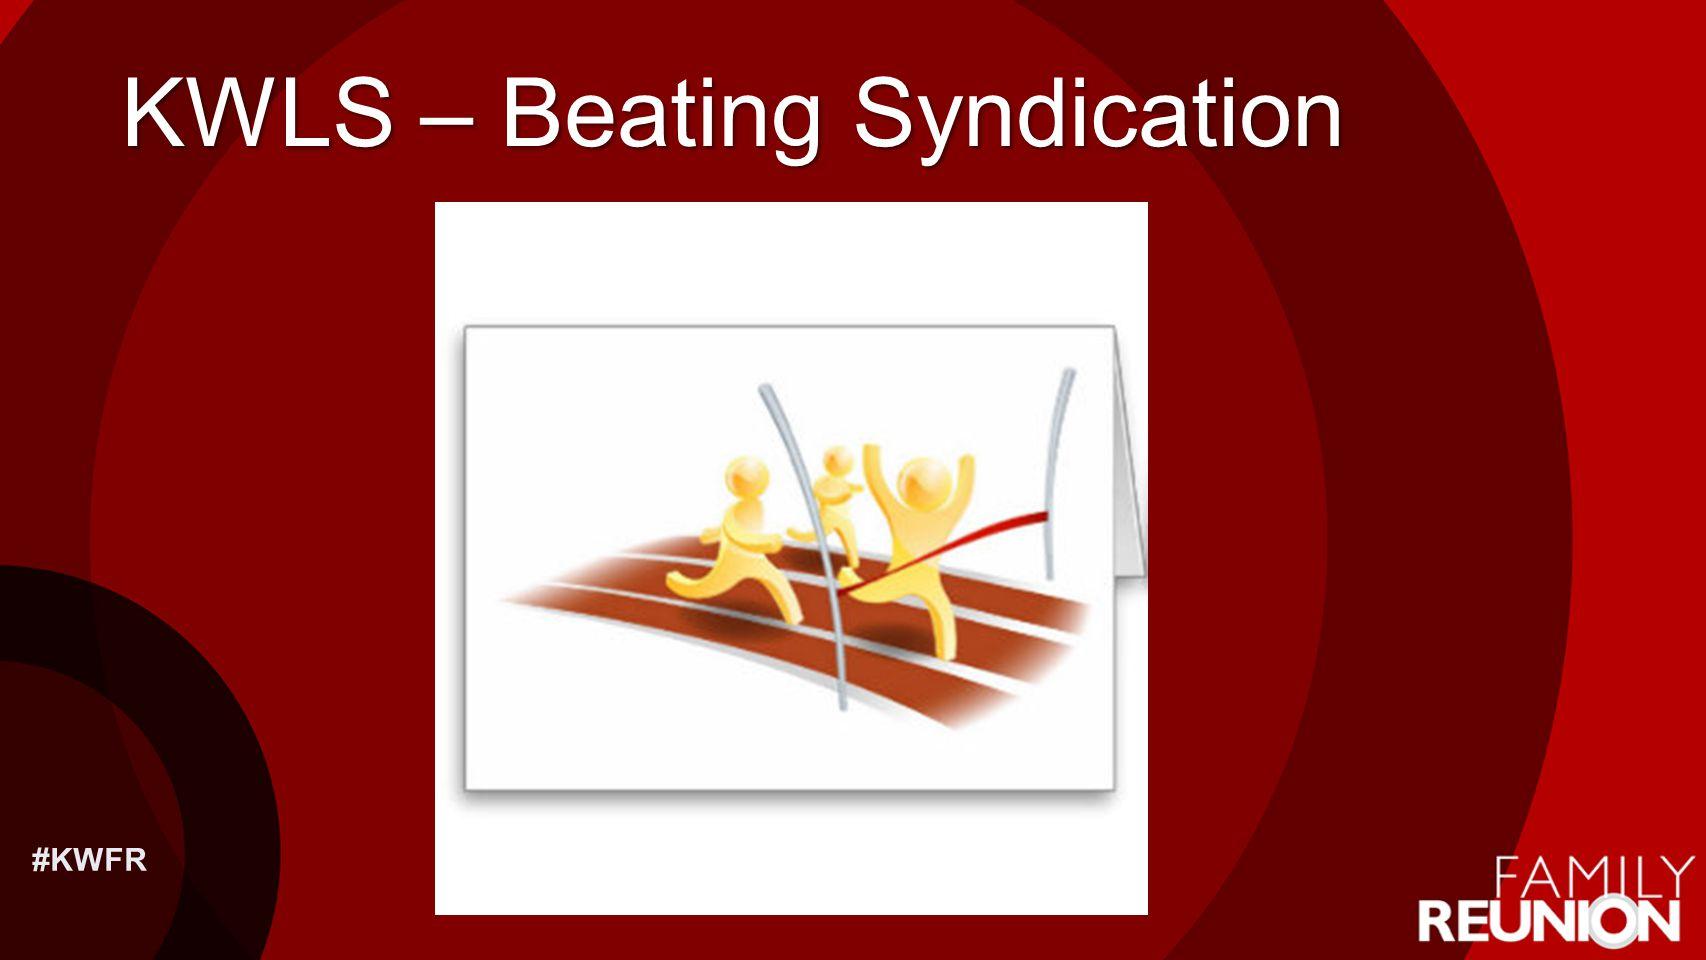 KWLS – Beating Syndication